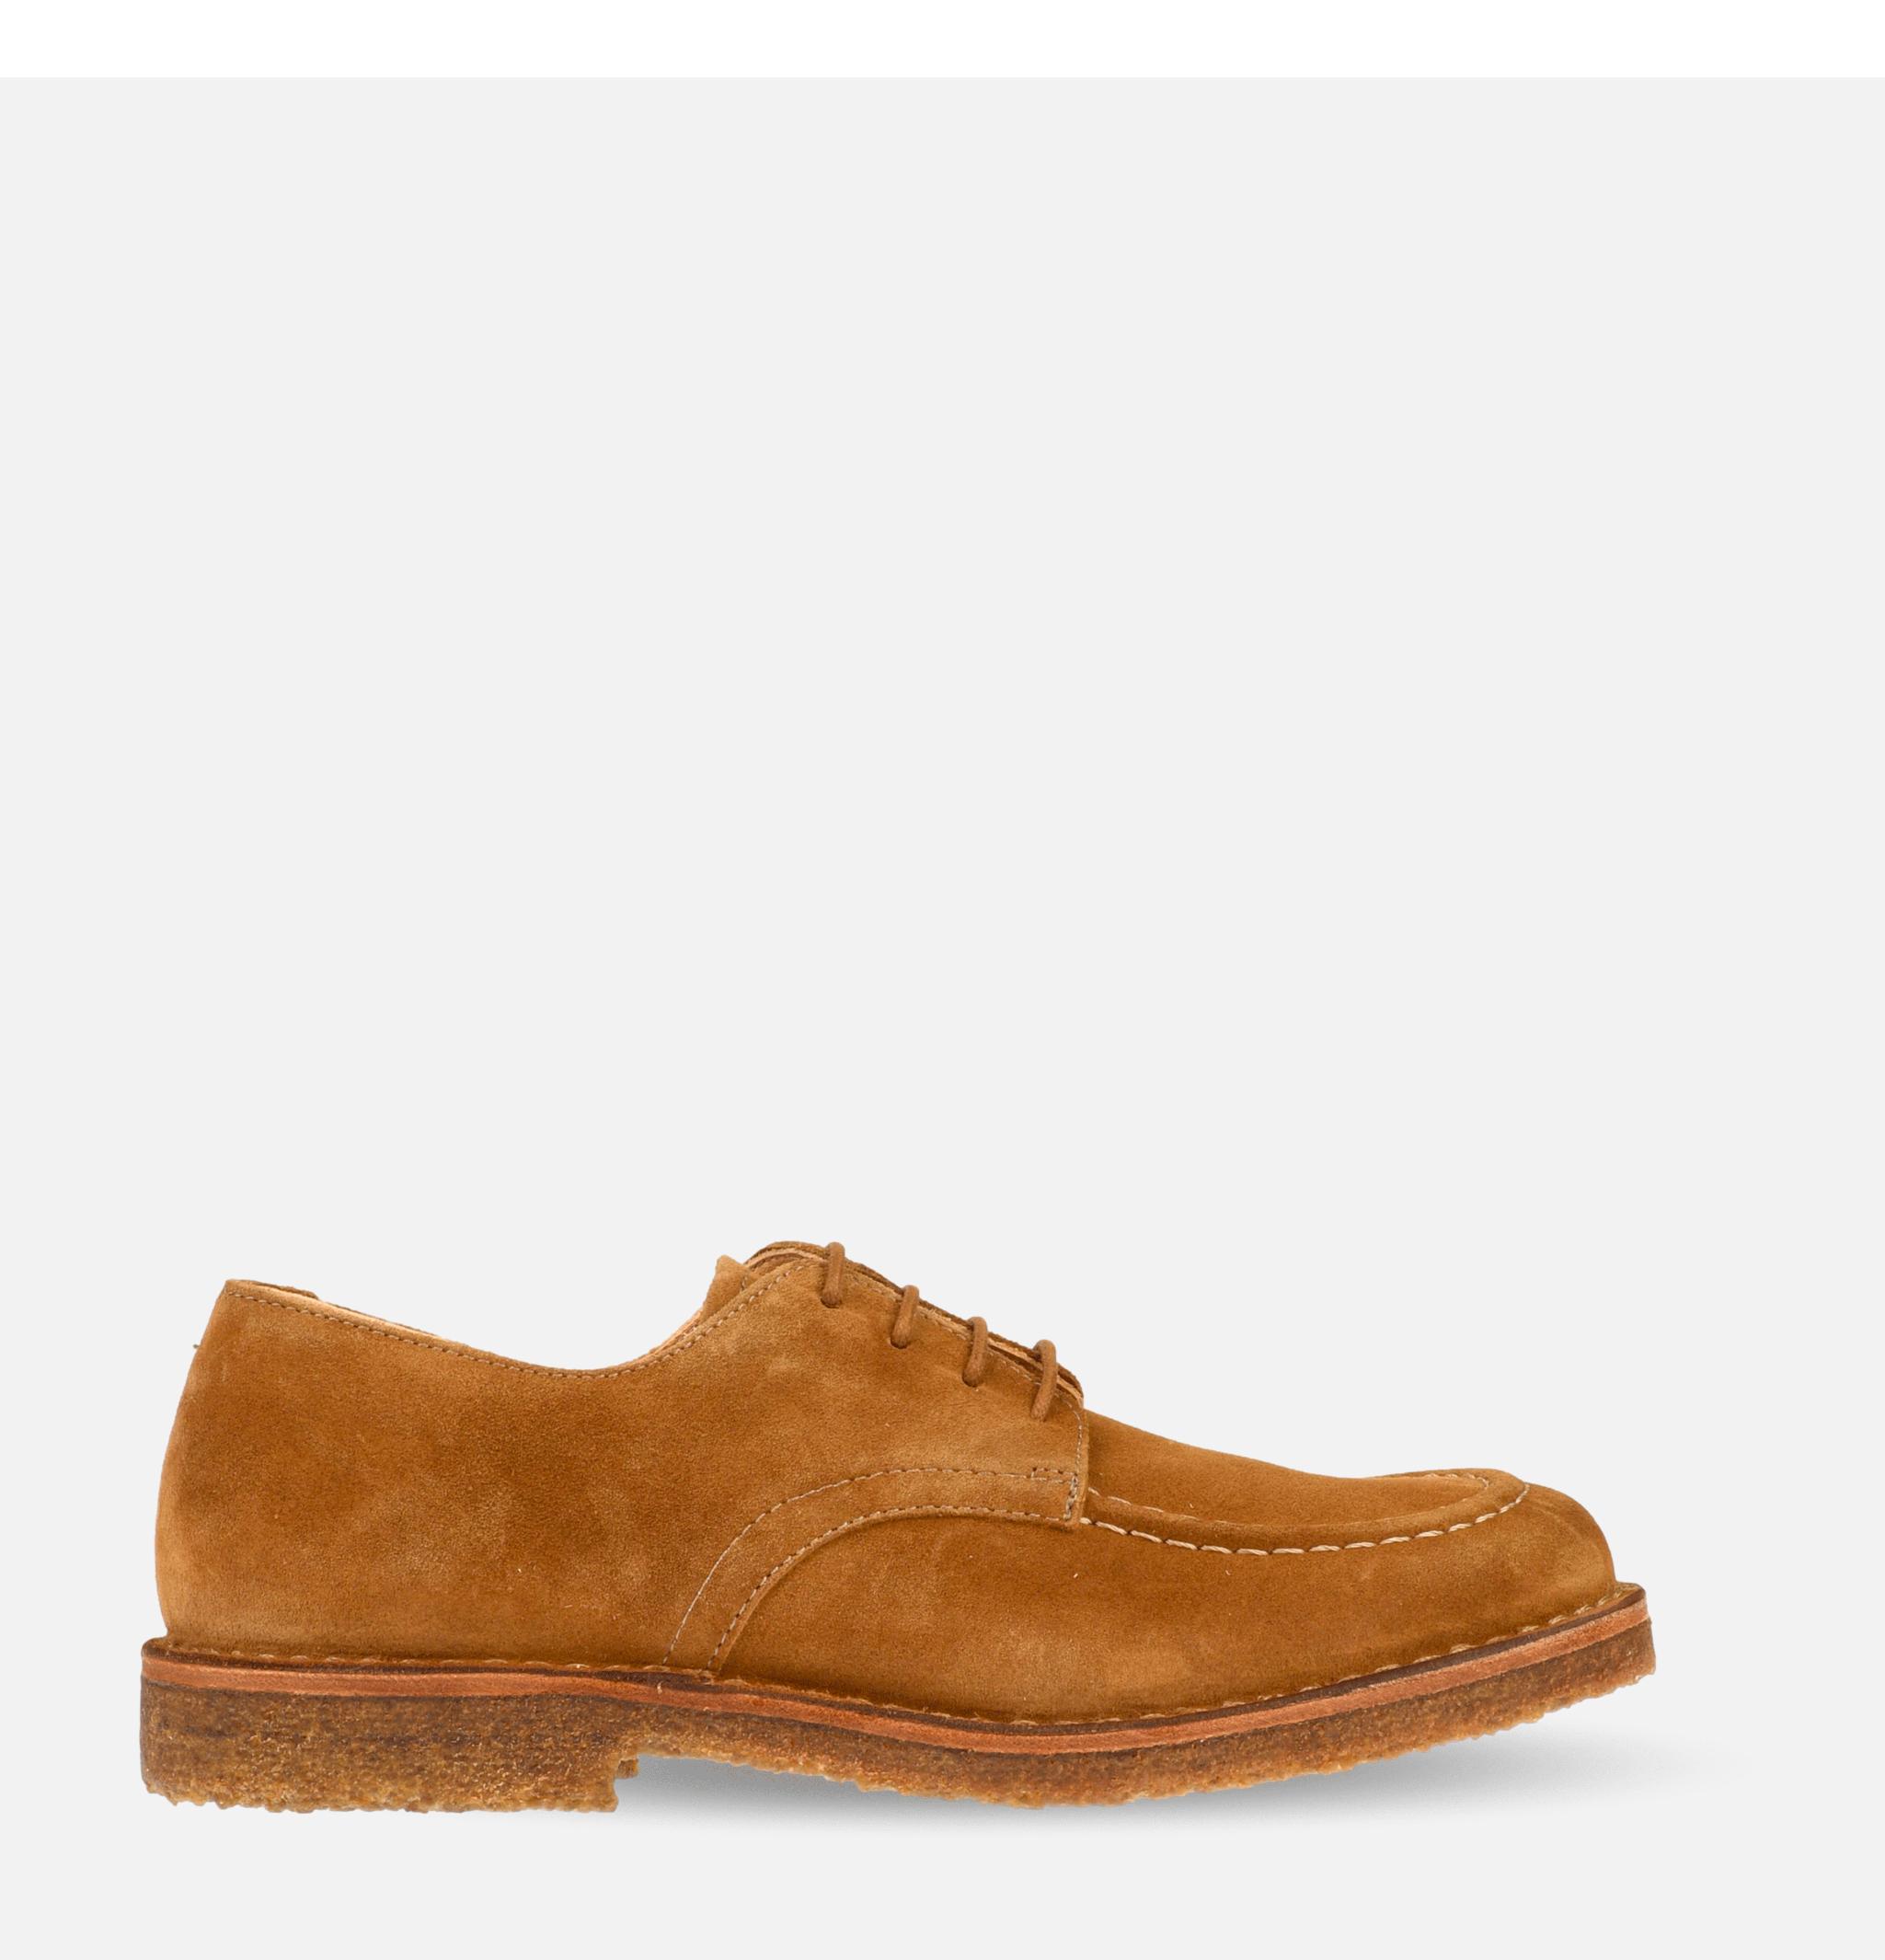 Chaussures Carlflex Whiskey